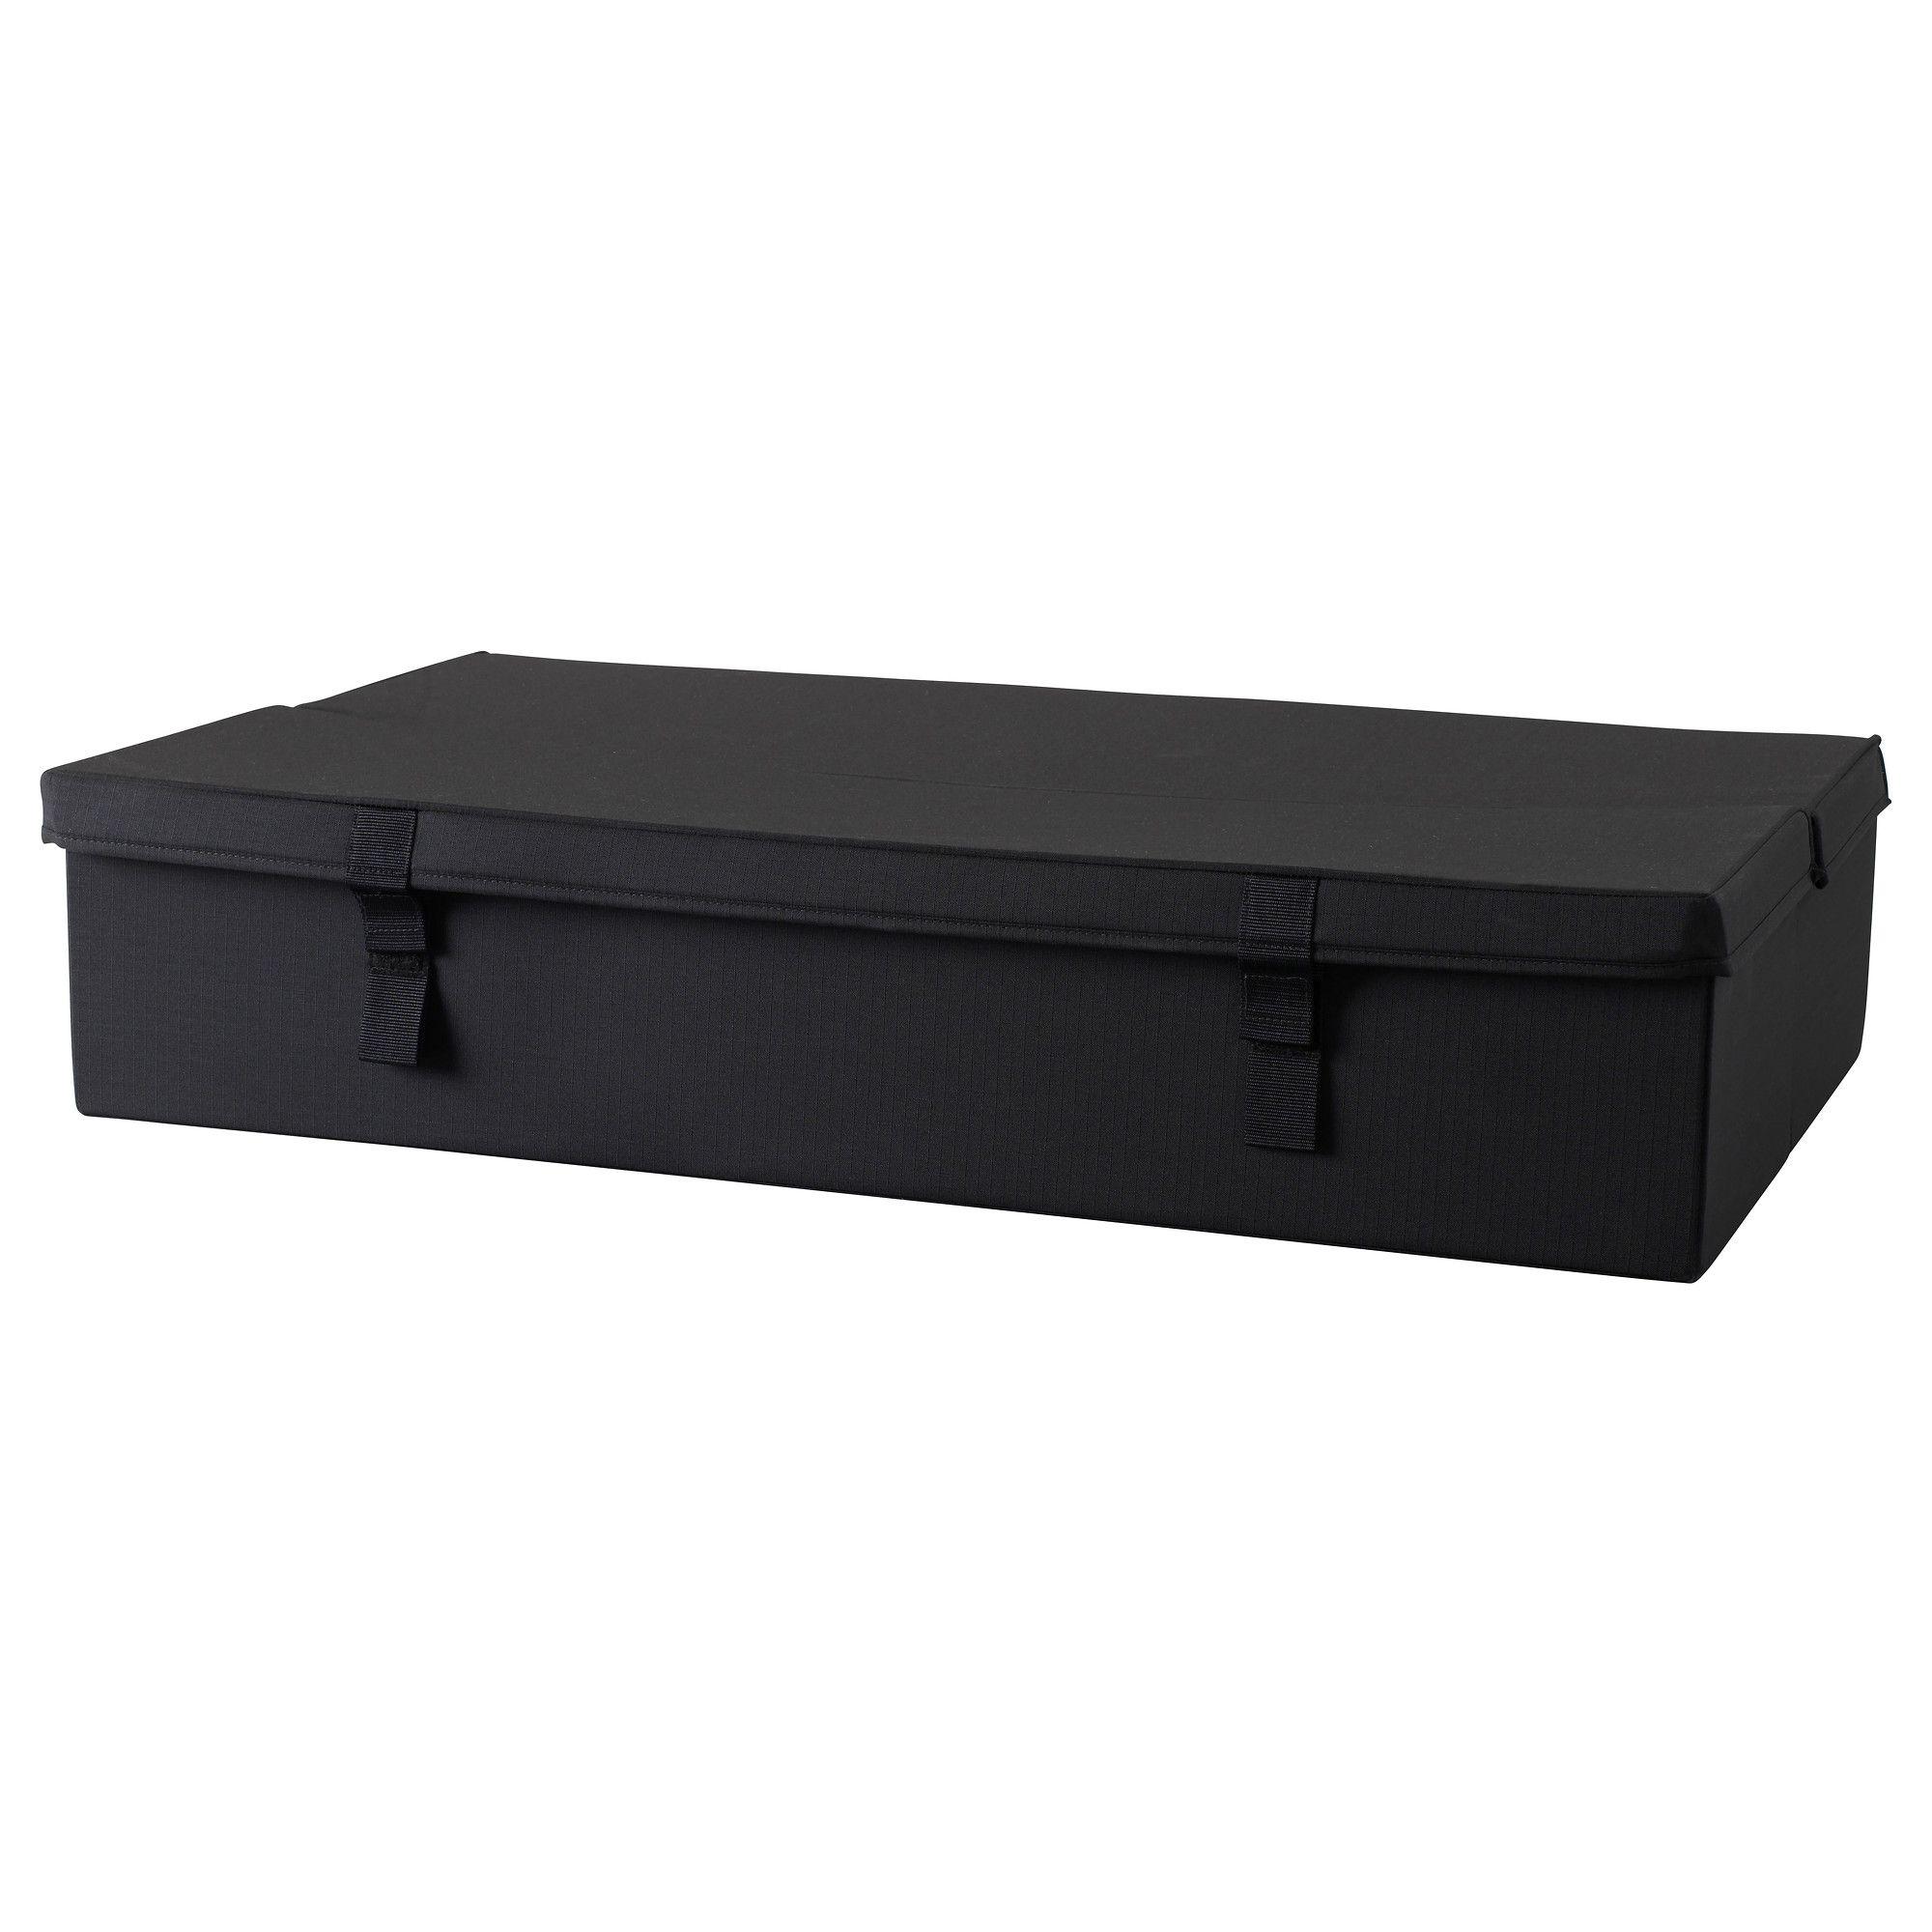 lycksele opberger 2 zits slaapbank zwart pinterest storage rh pinterest com beddinge sofa bed storage box beddinge sofa bed storage box